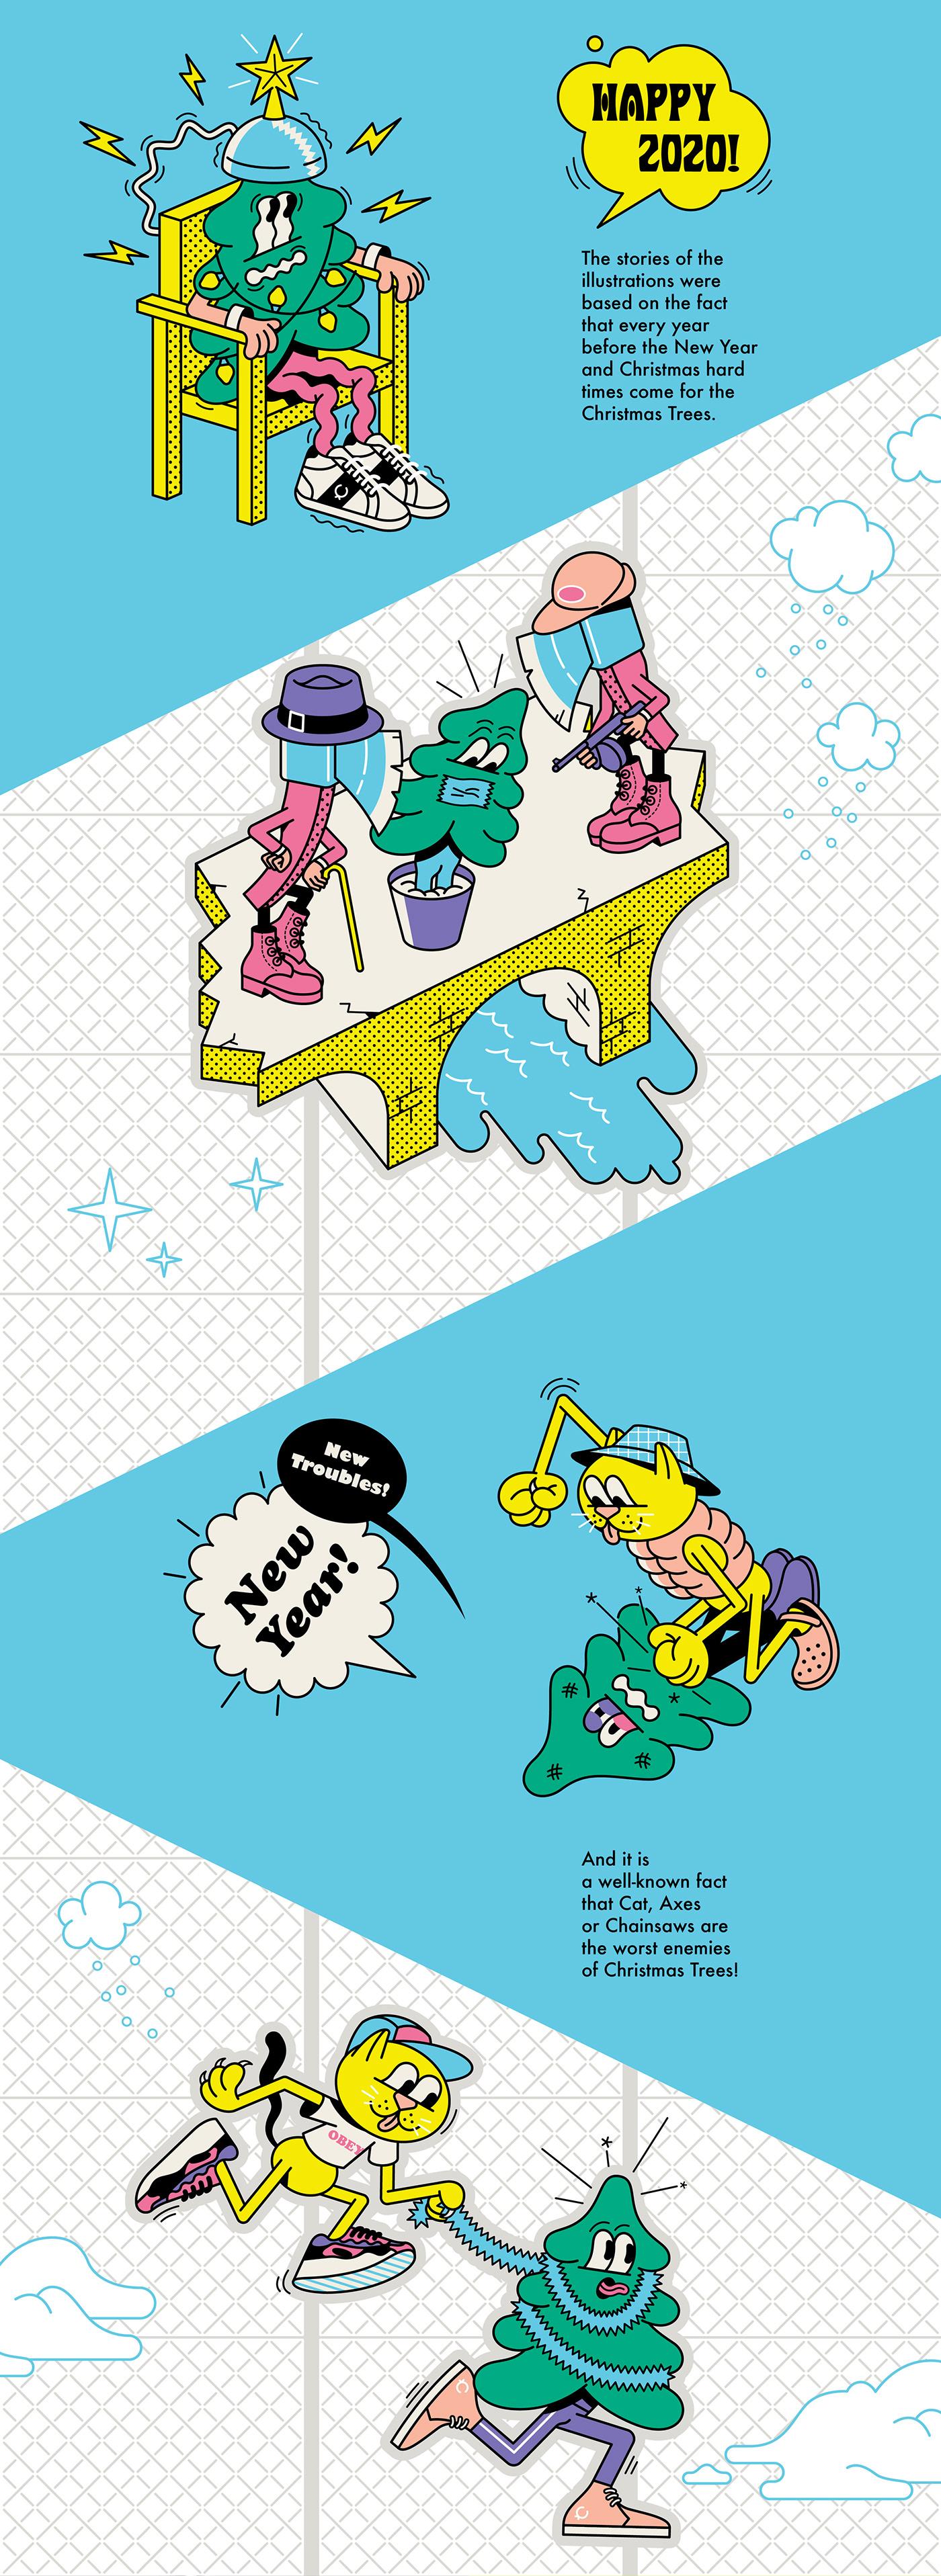 Cat Christmas christmas Tree fight new year sticker streetwear video violence xmas